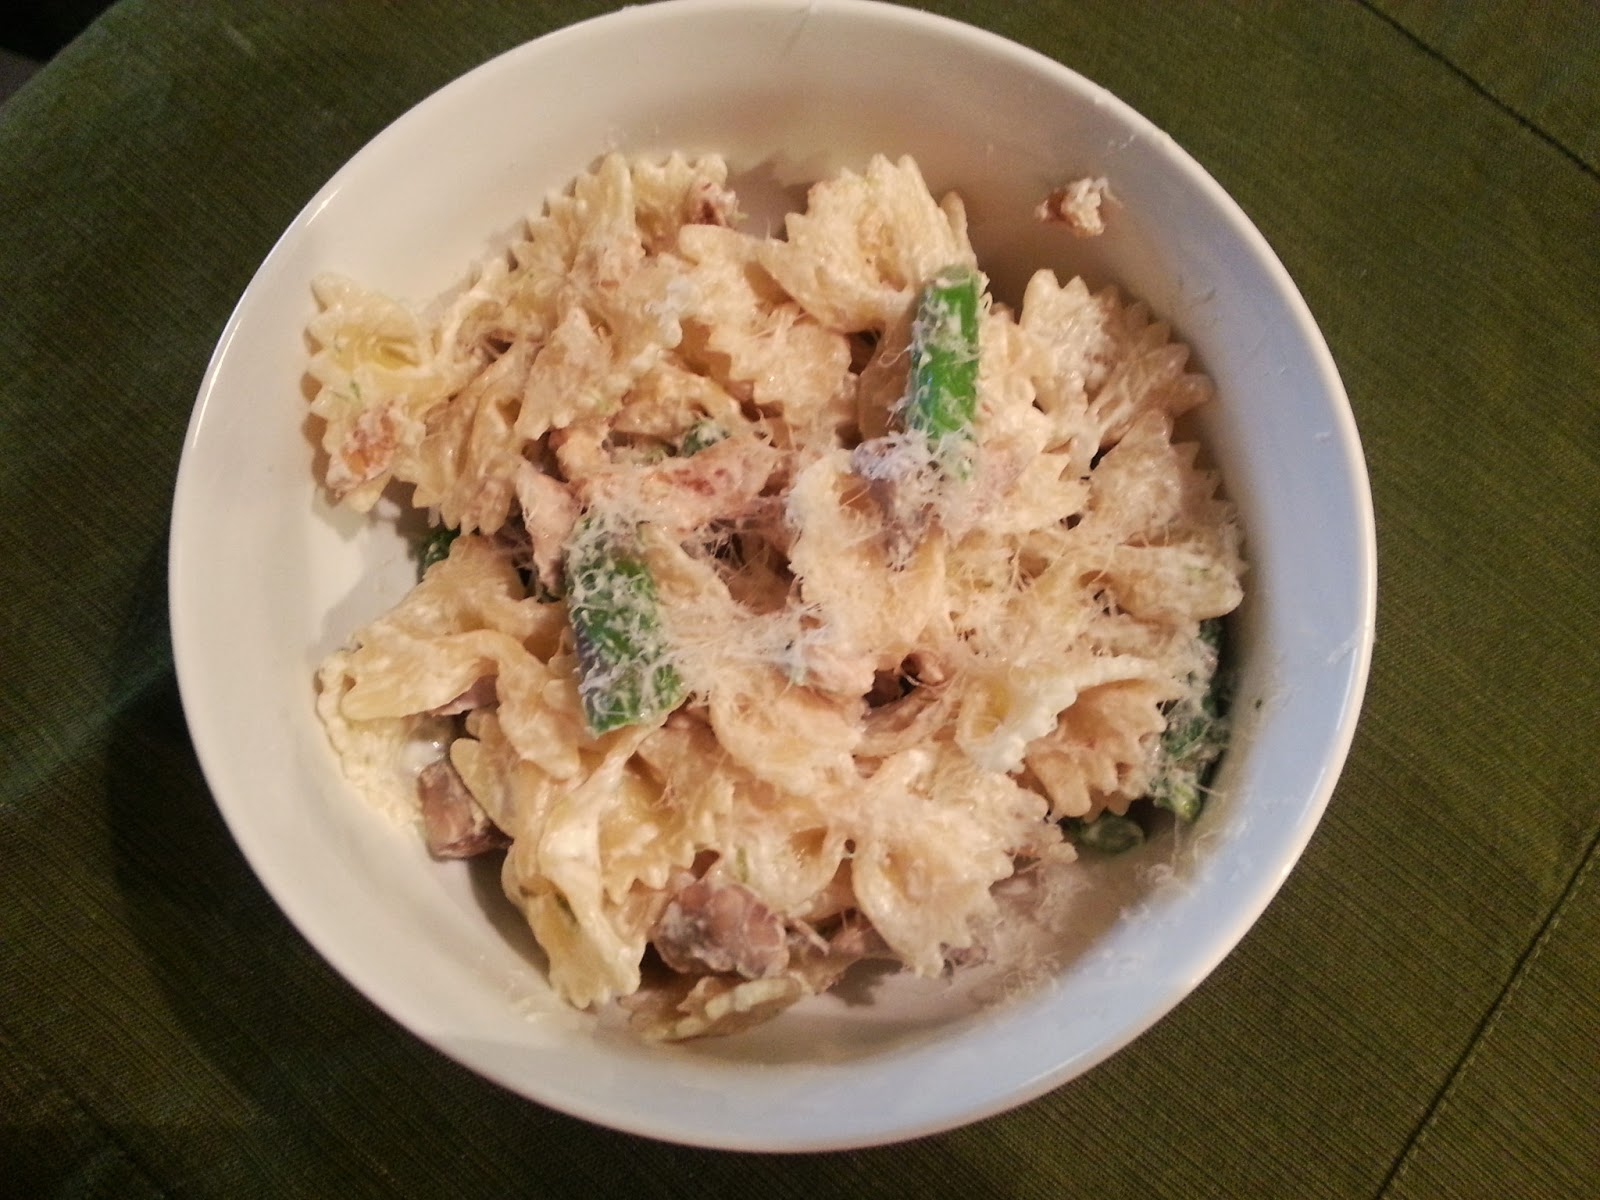 katiemakes: pasta with asparagus, mushrooms, and walnuts